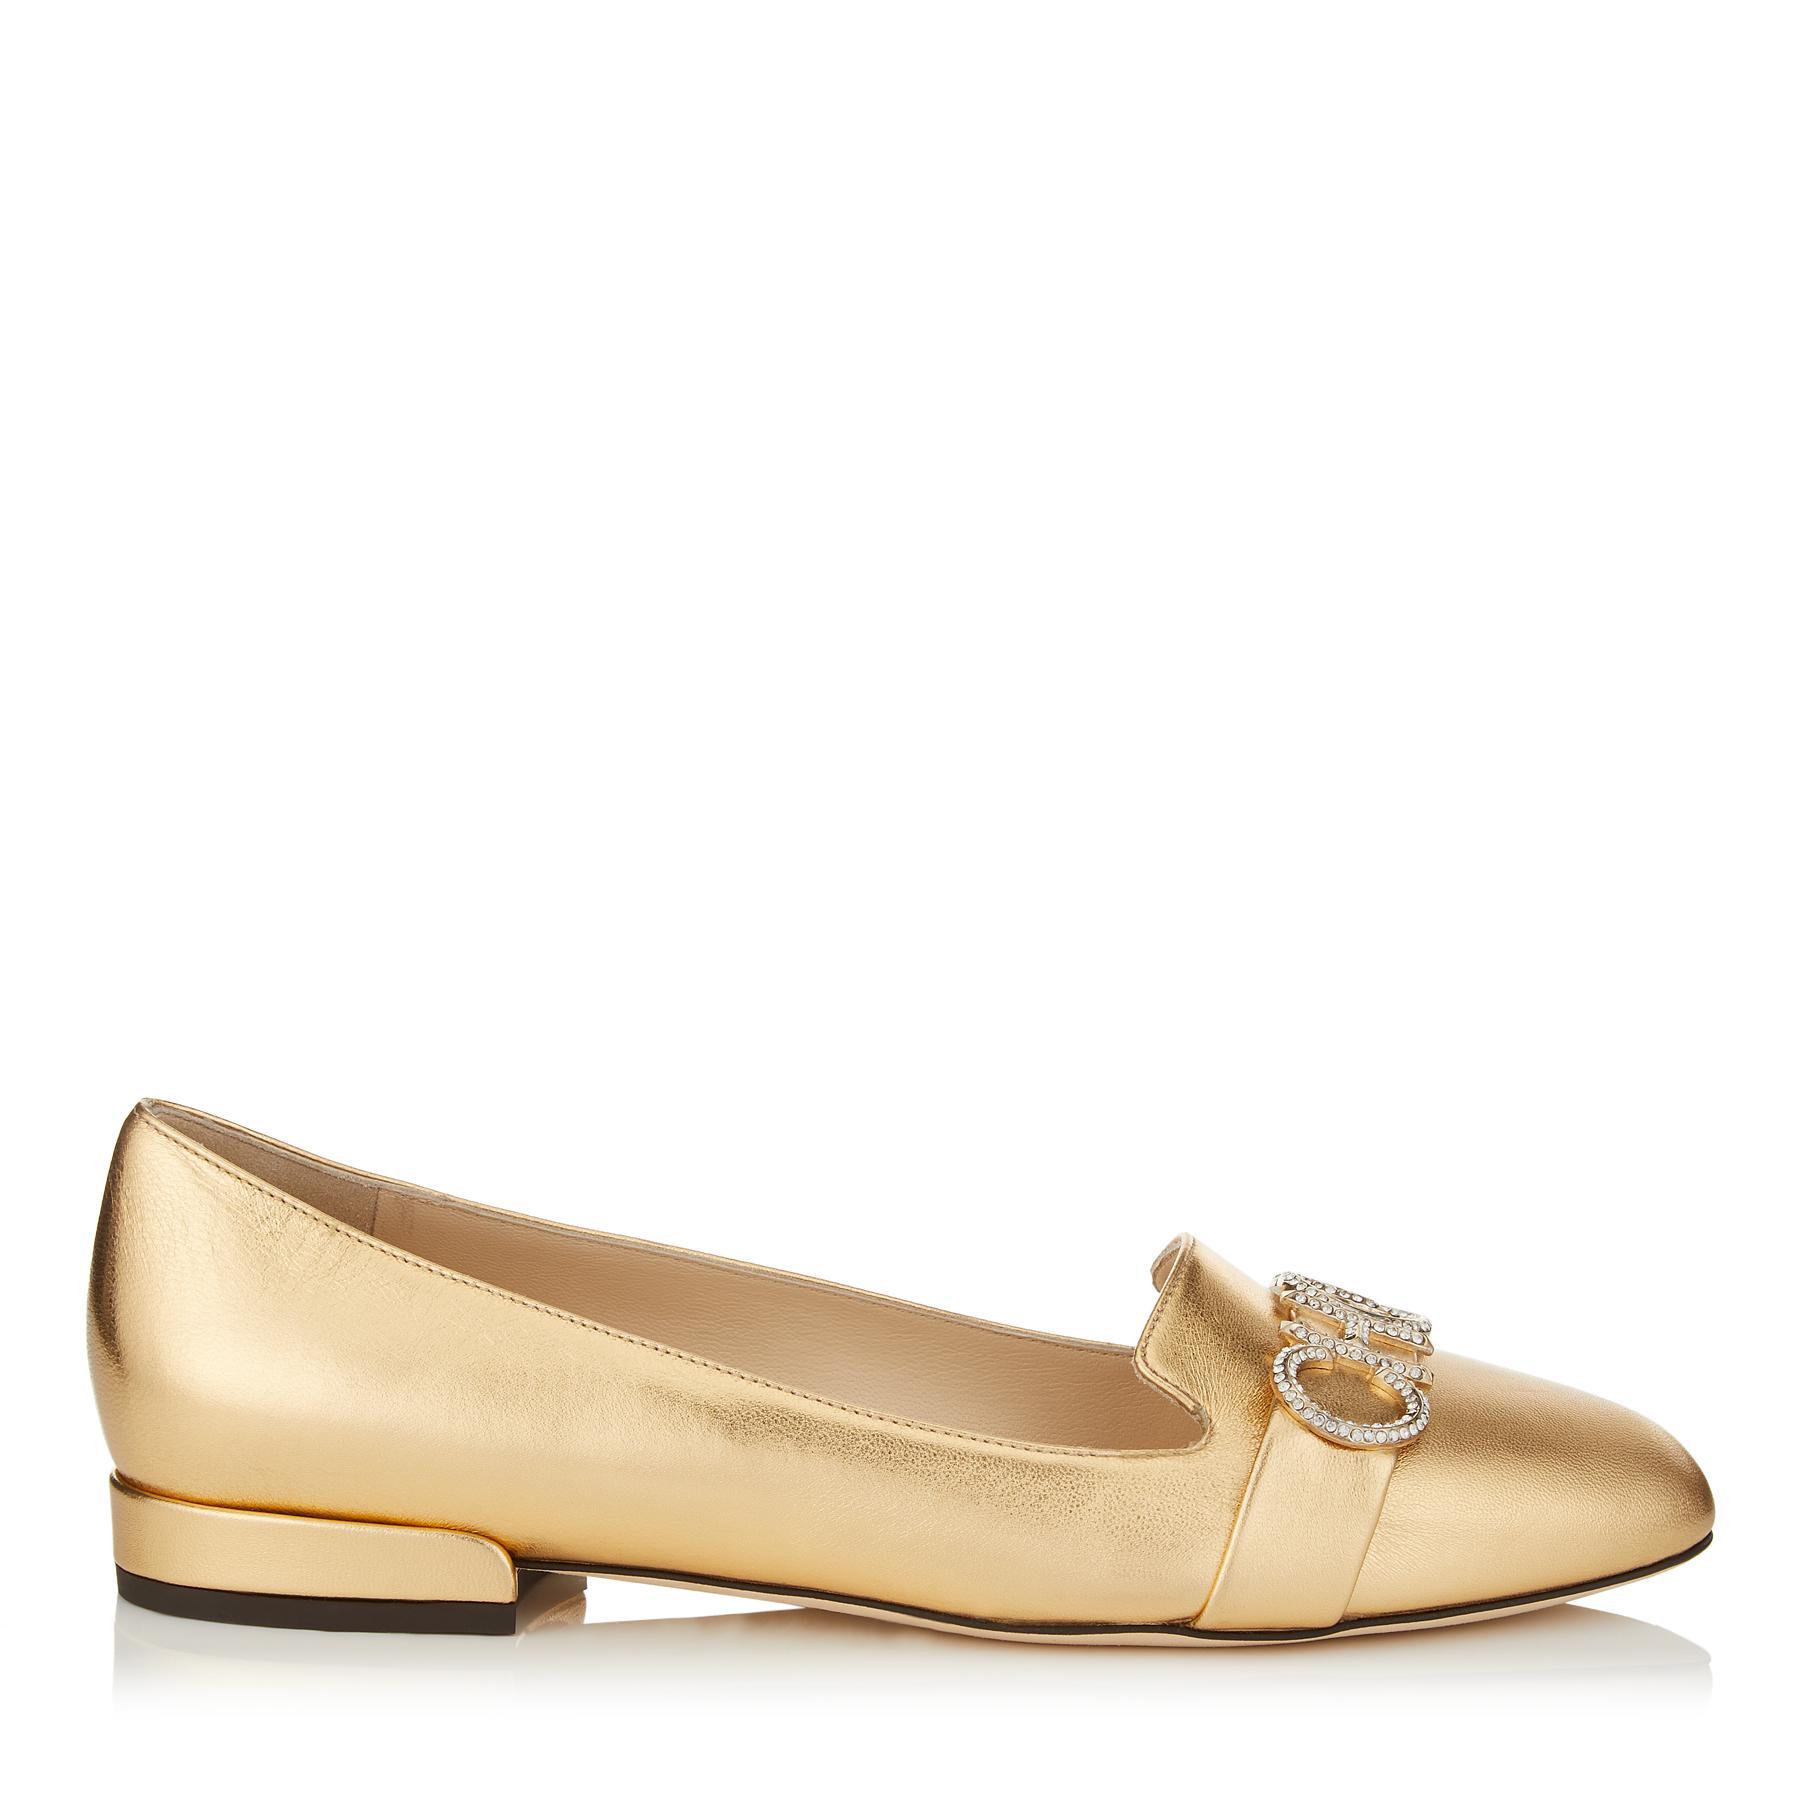 3a4f13dbe0f9 Lyst - Jimmy Choo Jaden Flat Gold Metallic Leather Round Toe ...